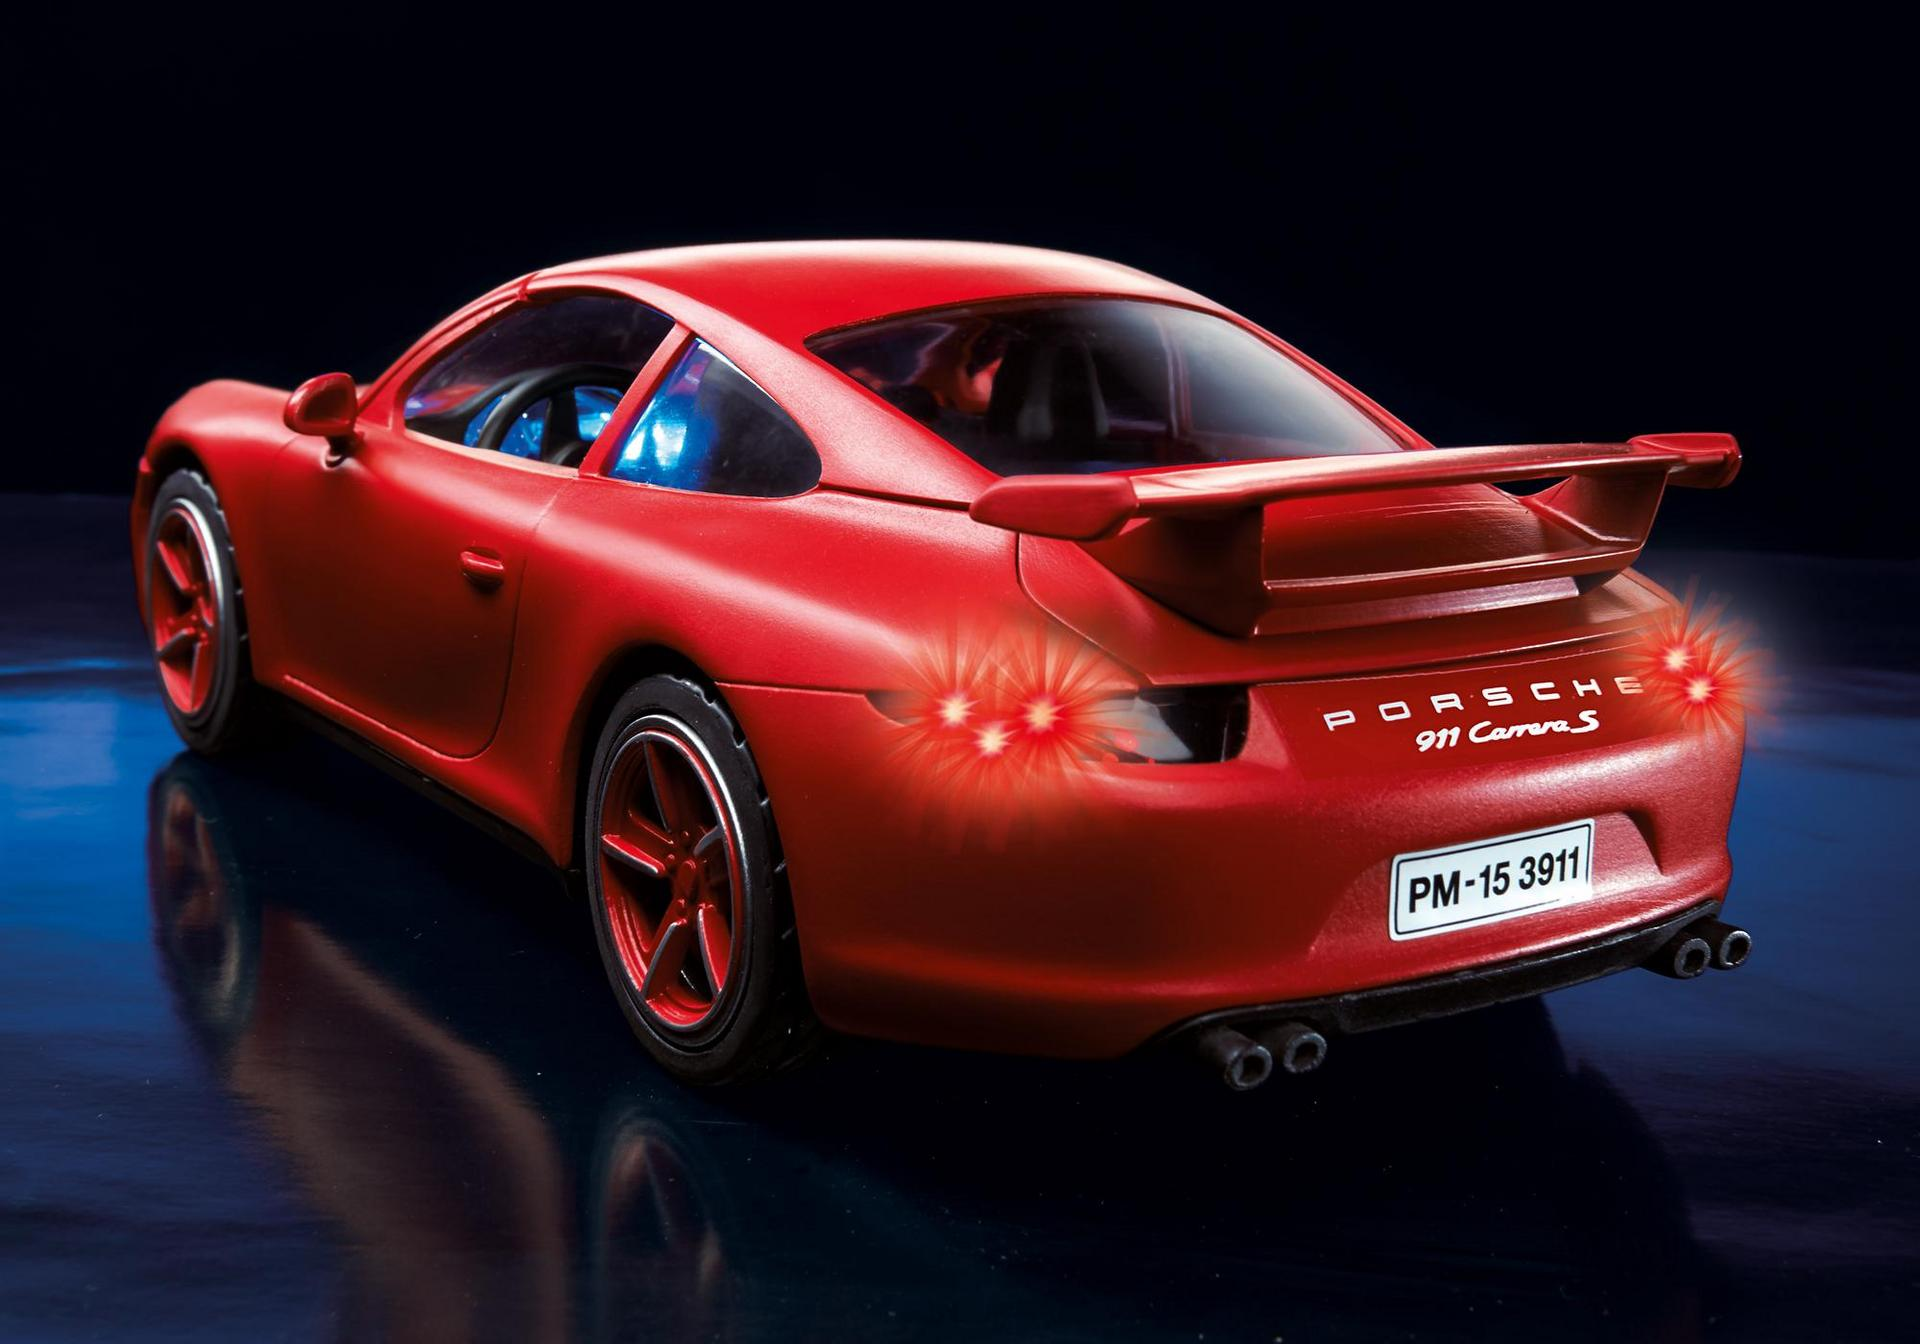 porsche 911 carrera s 3911 playmobil usa. Black Bedroom Furniture Sets. Home Design Ideas